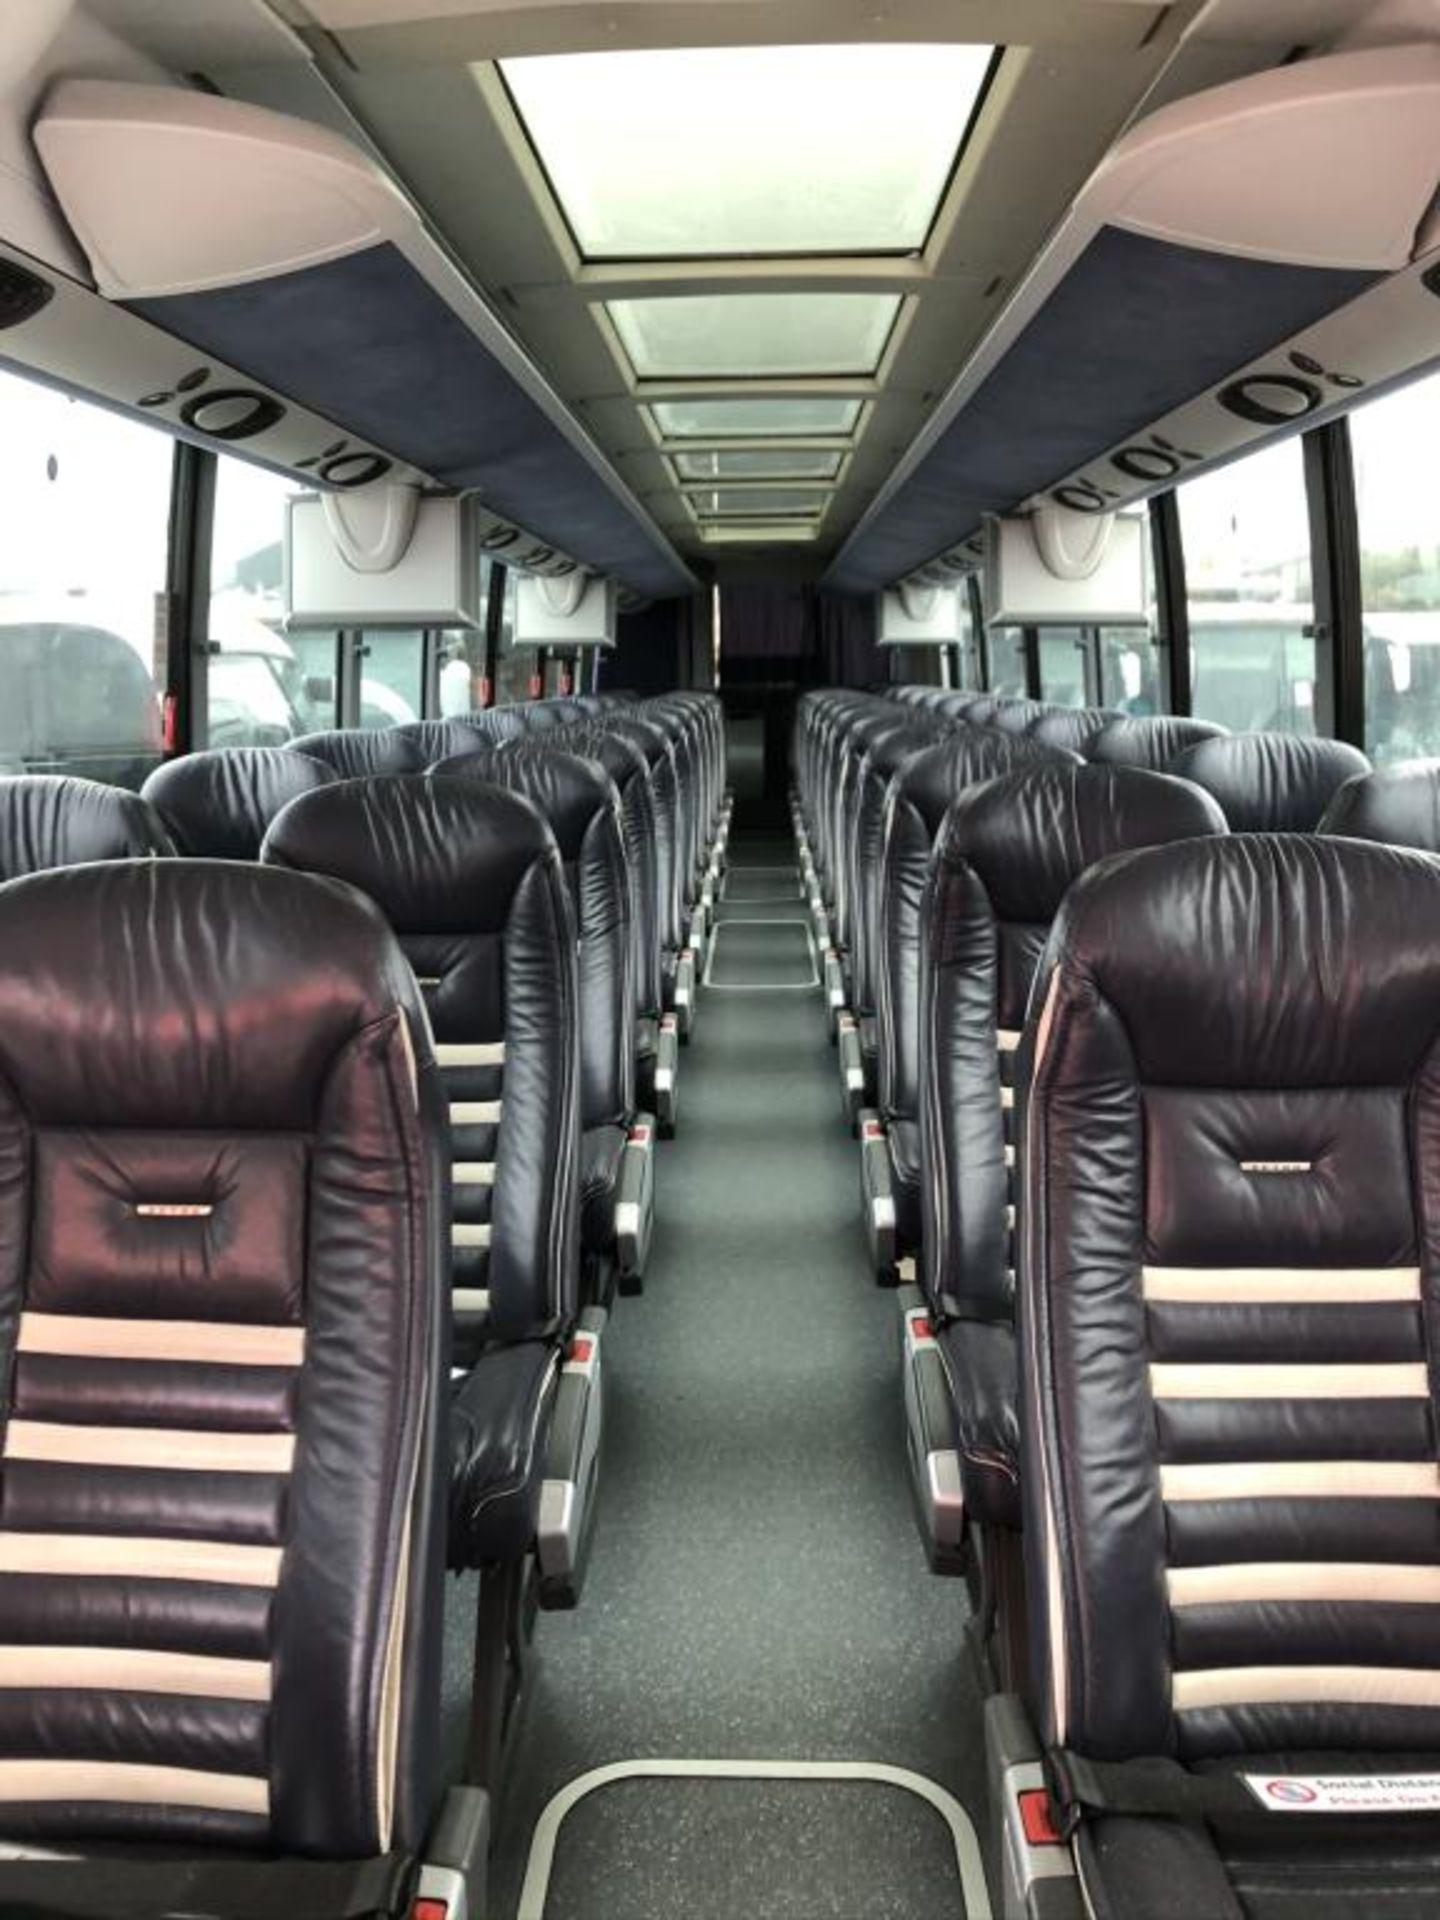 Motor Coach - Image 7 of 17